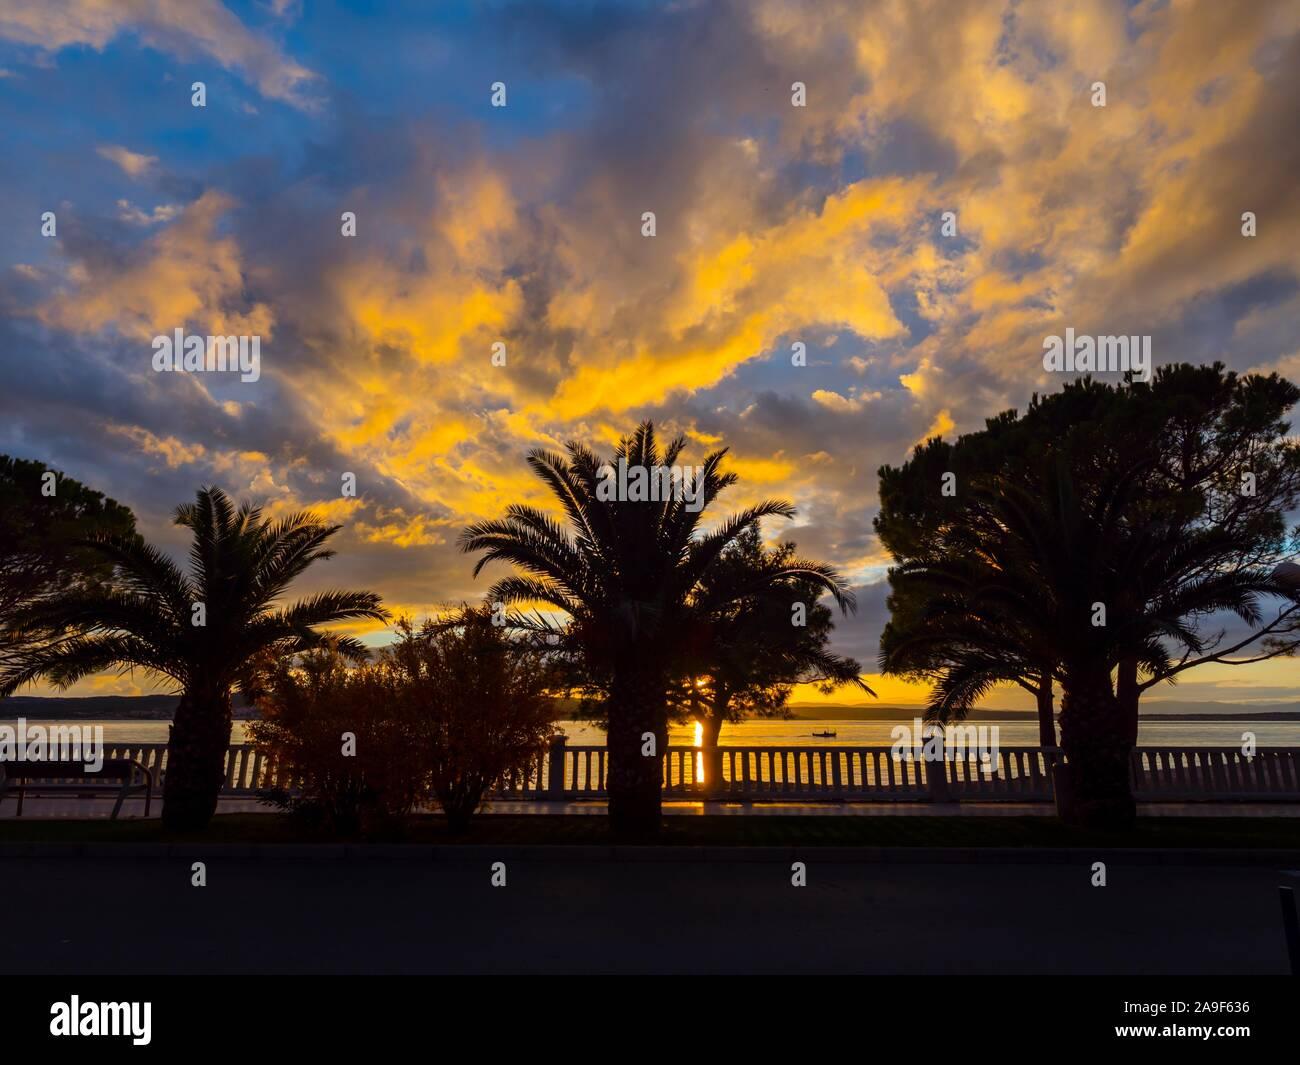 Crikvenica in Croatia evening sunset waterfront seaside promenade scenery Stock Photo